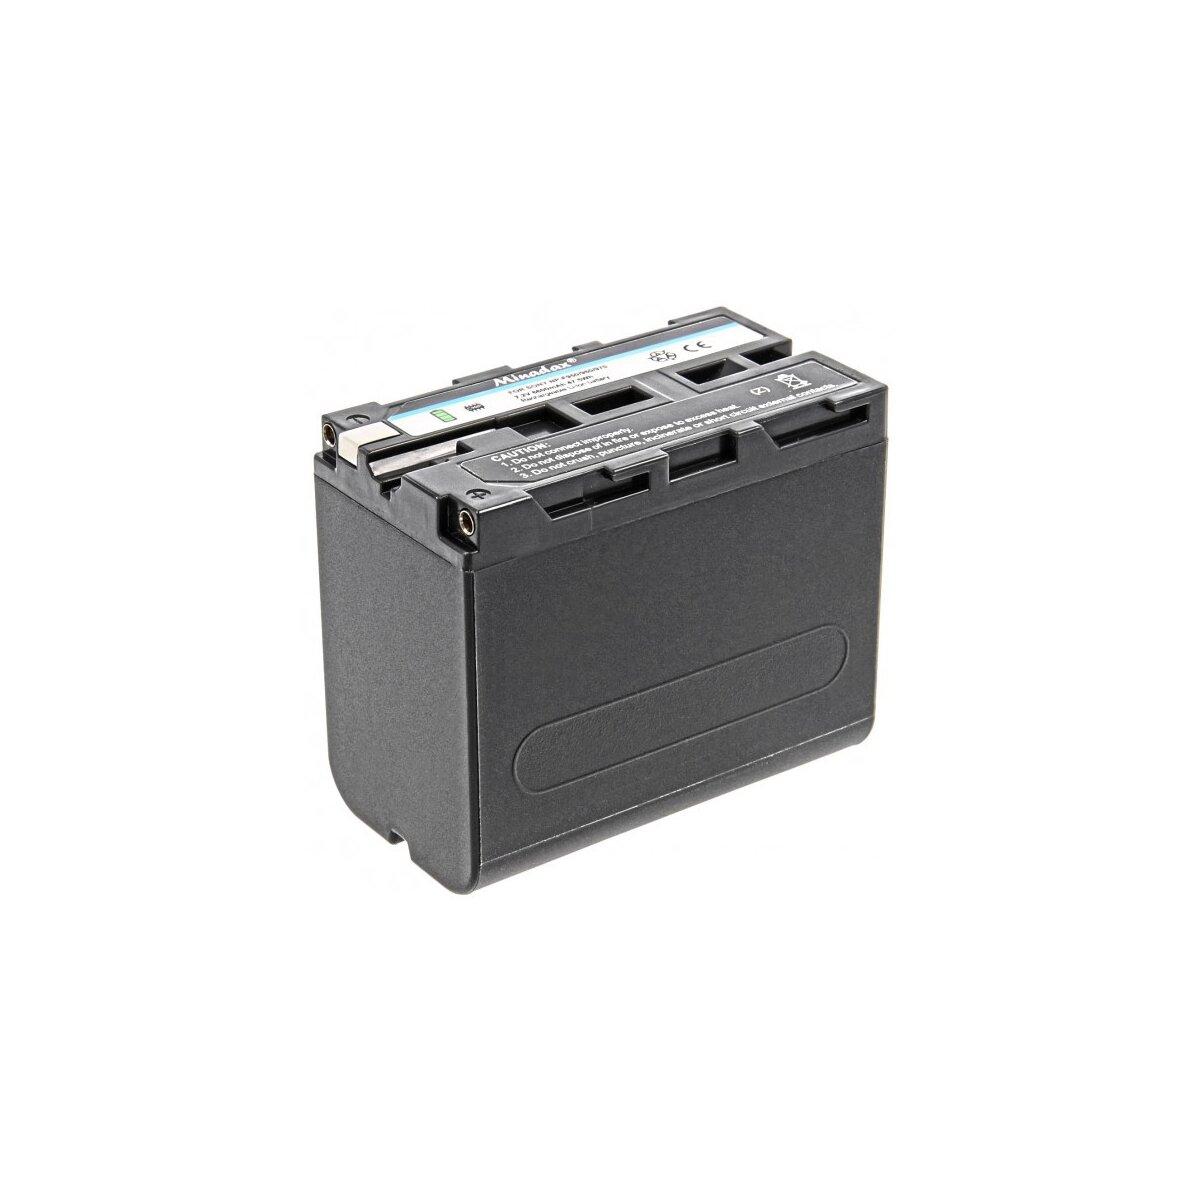 Minadax Qualitätsakku mit echten 6600 mAh kompatibel für Sony CCD-TR Series CCD-TRV Series Sony DCR-TR Series Sony DCS-CD Sony MVC-FD Series Ersatz für NP-F970 - Intelligentes Akkusystem mit Chip